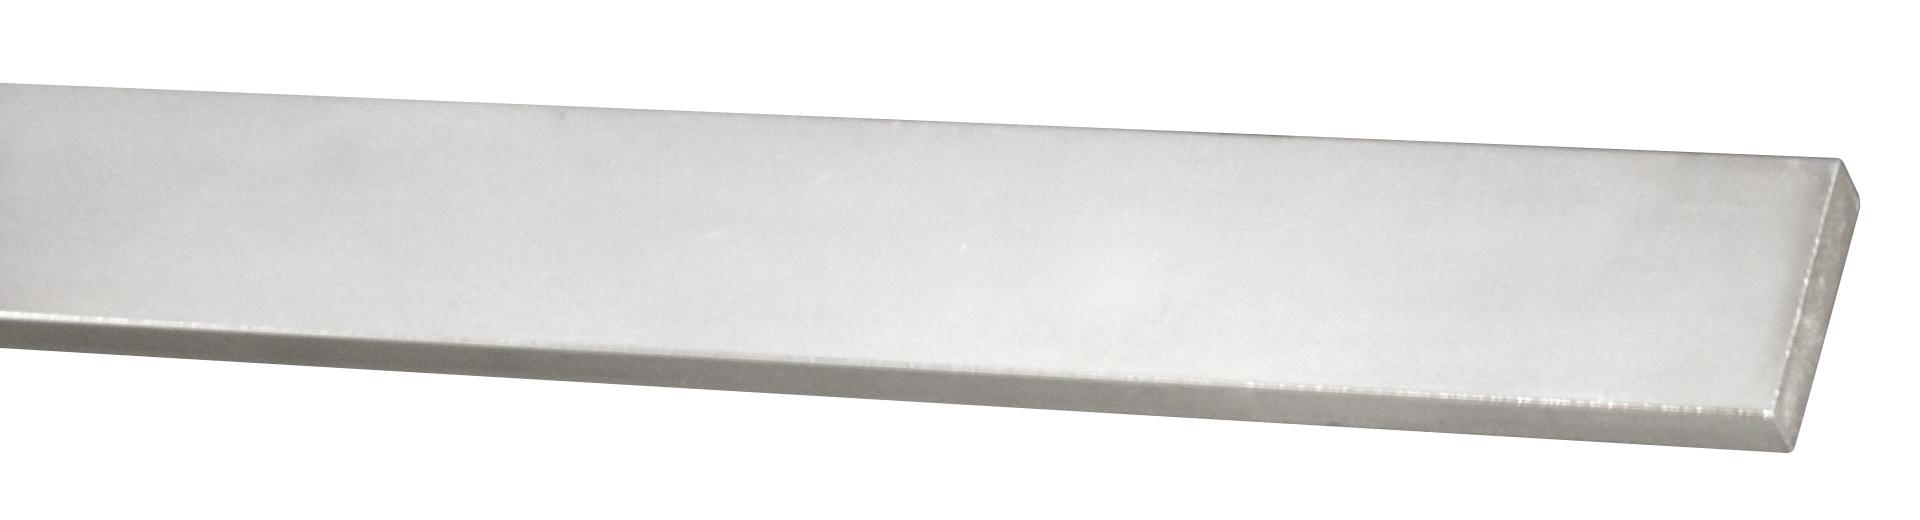 SI016200 - Schrack Technik